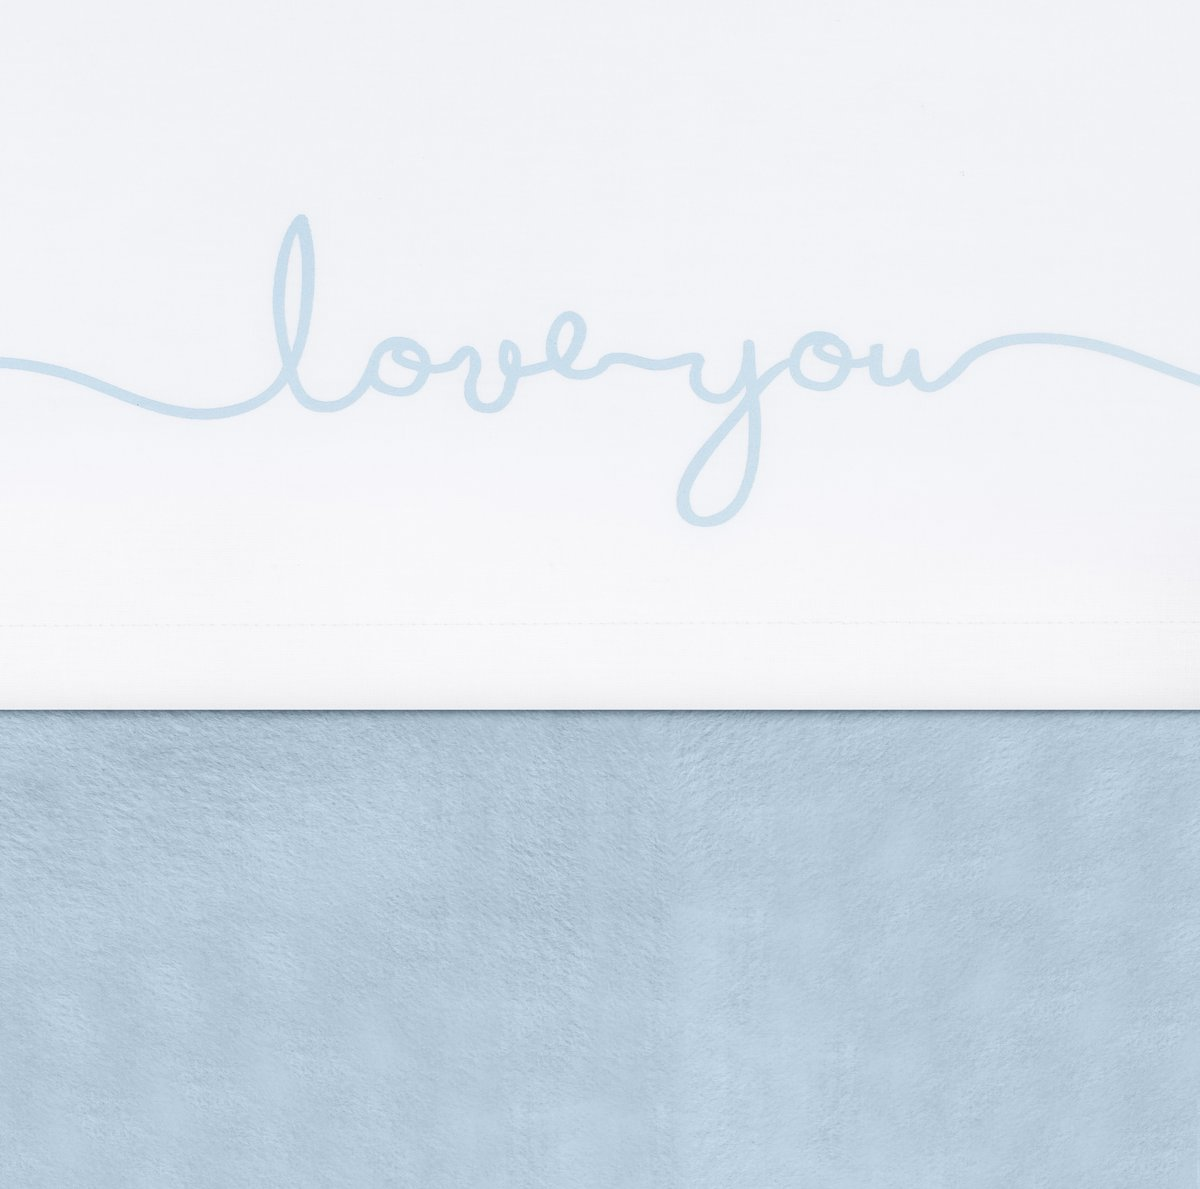 Jollein Love you Laken 75x100cm wit met soft blue tekst